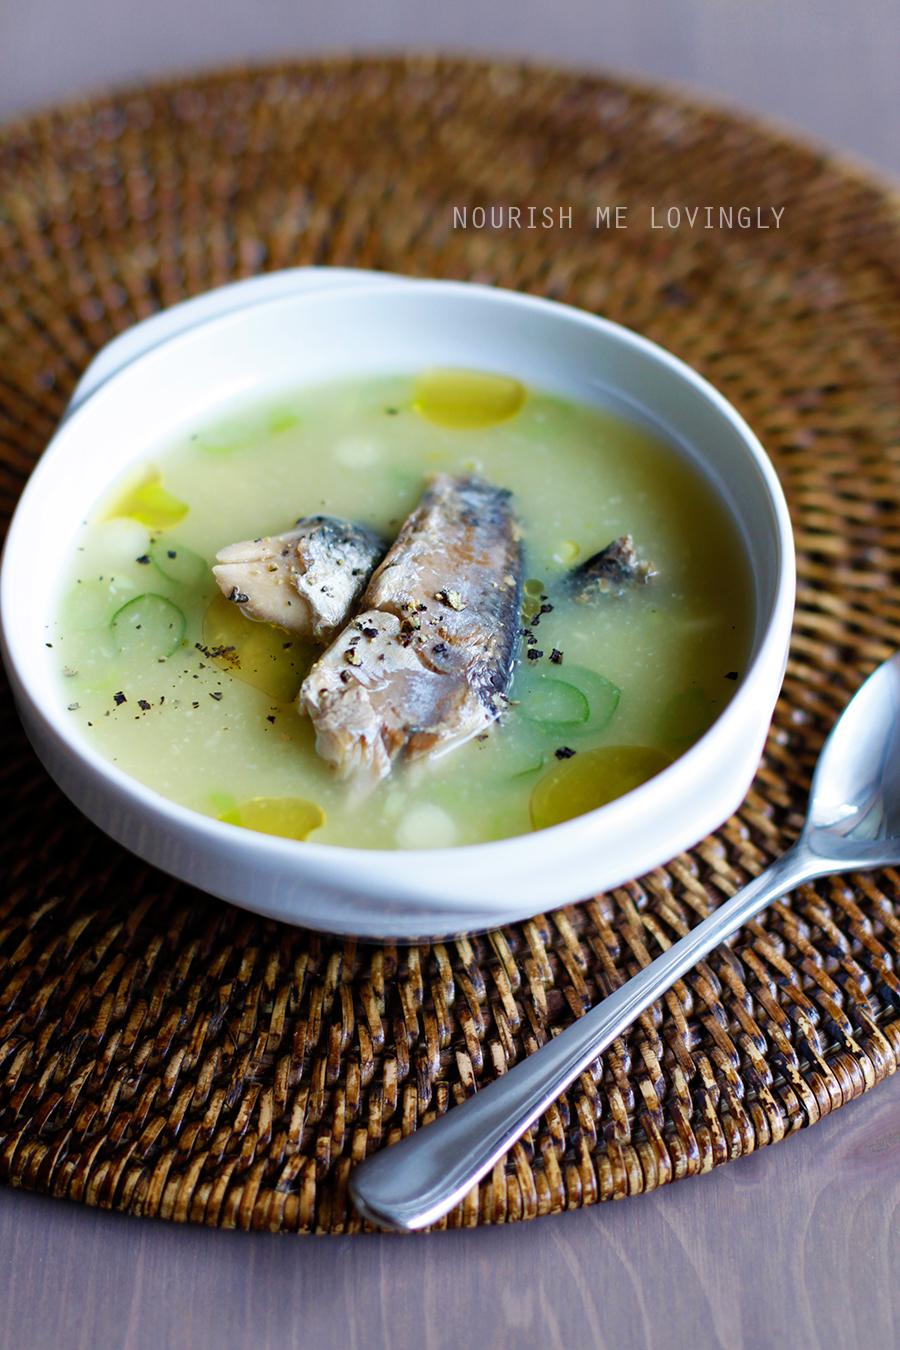 Nourish me lovingly creamy fish soup gaps for Creamy fish soup recipe